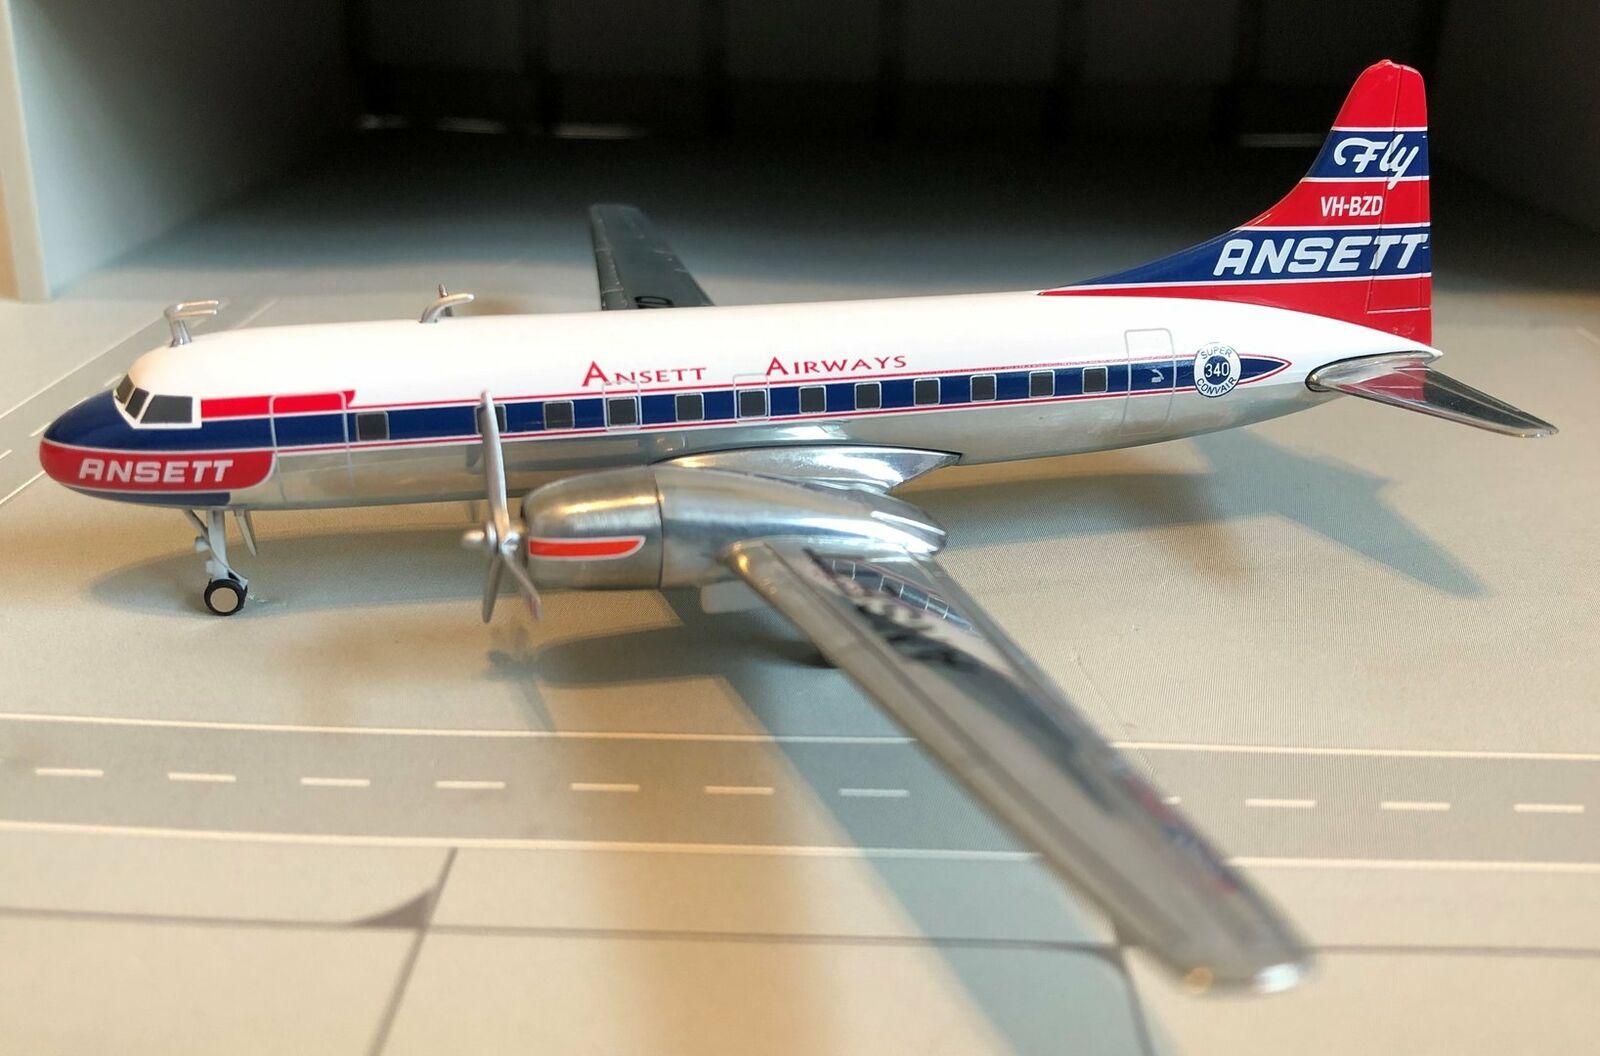 559706 Ansett AIRWAYS CONVAIR CV-340, 1 200